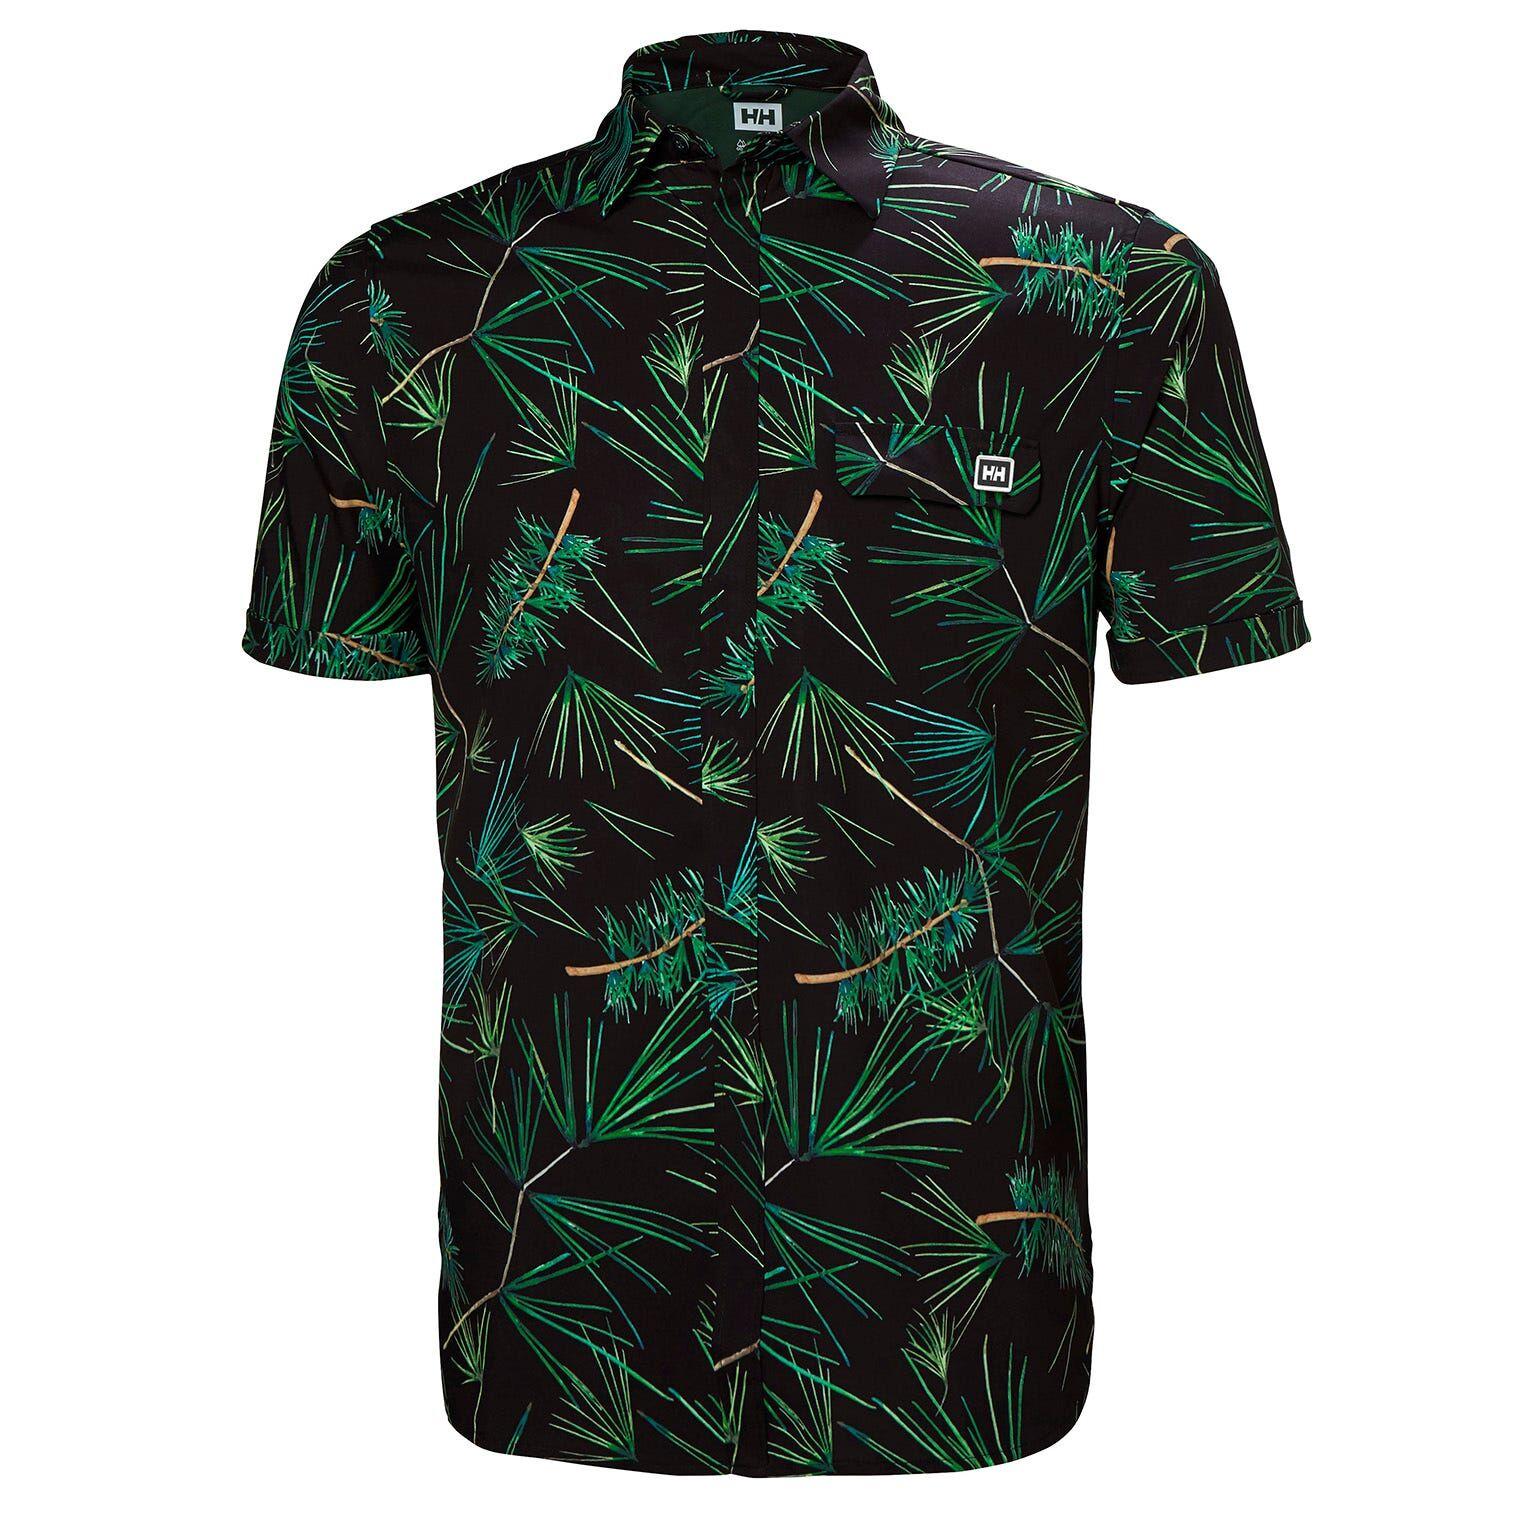 Helly Hansen Oya Shirt Black L